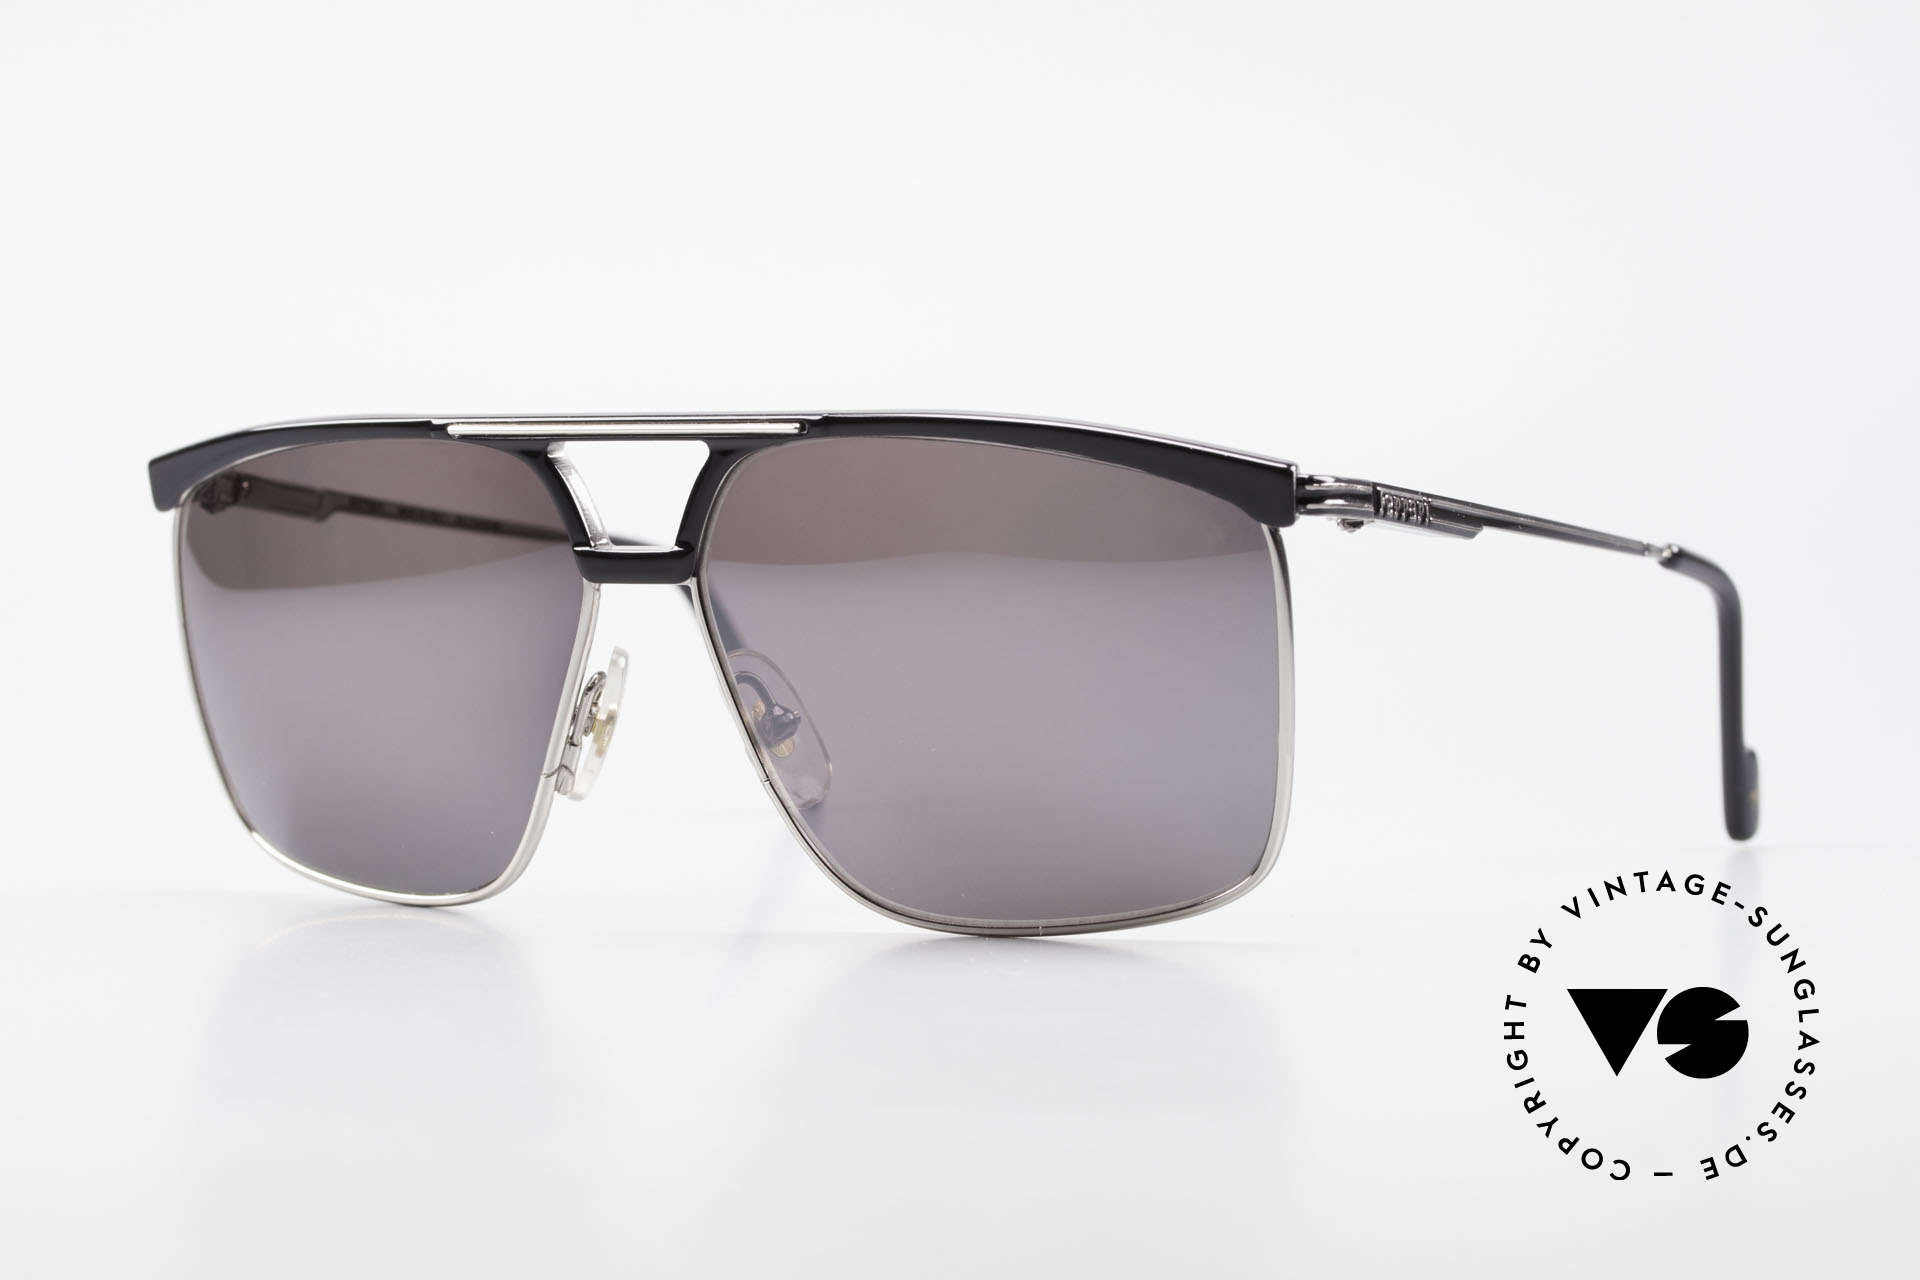 Ferrari F35 X-Large Mirrored Sunglasses, very masculine Ferrari FORMULA 1 vintage sunglasses, Made for Men